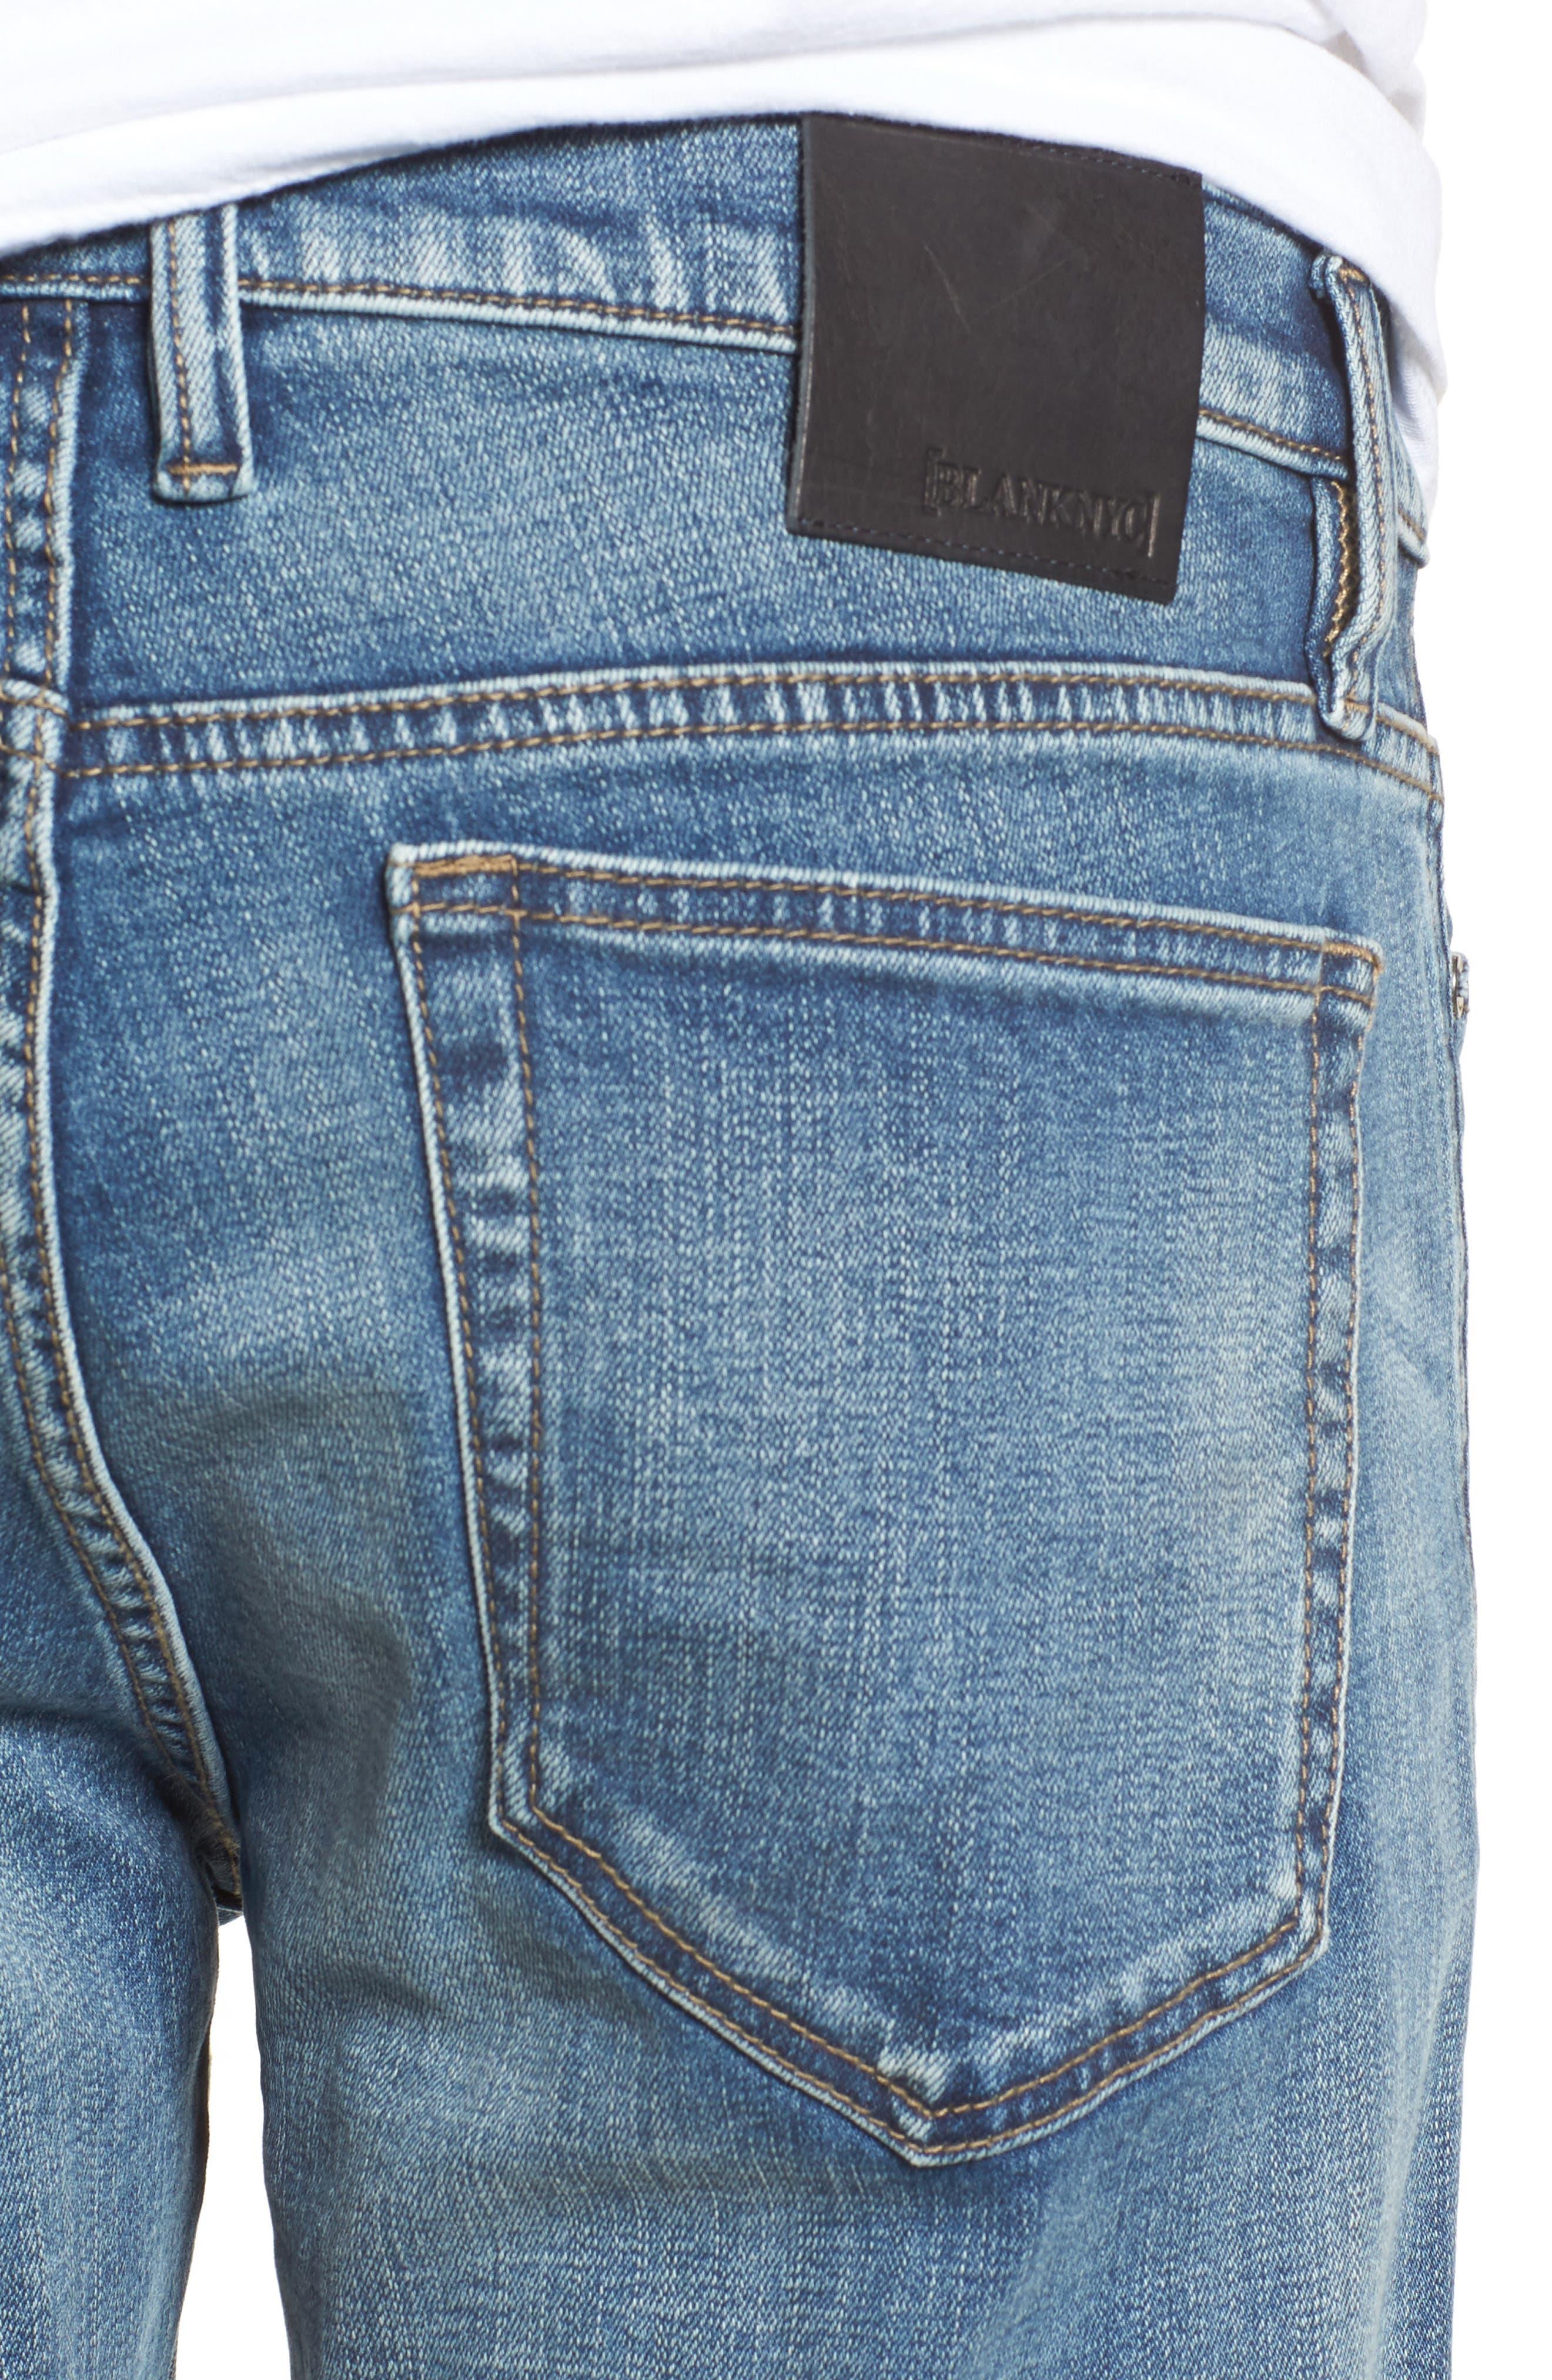 Wooster Slim Fit Jeans,                             Alternate thumbnail 4, color,                             400